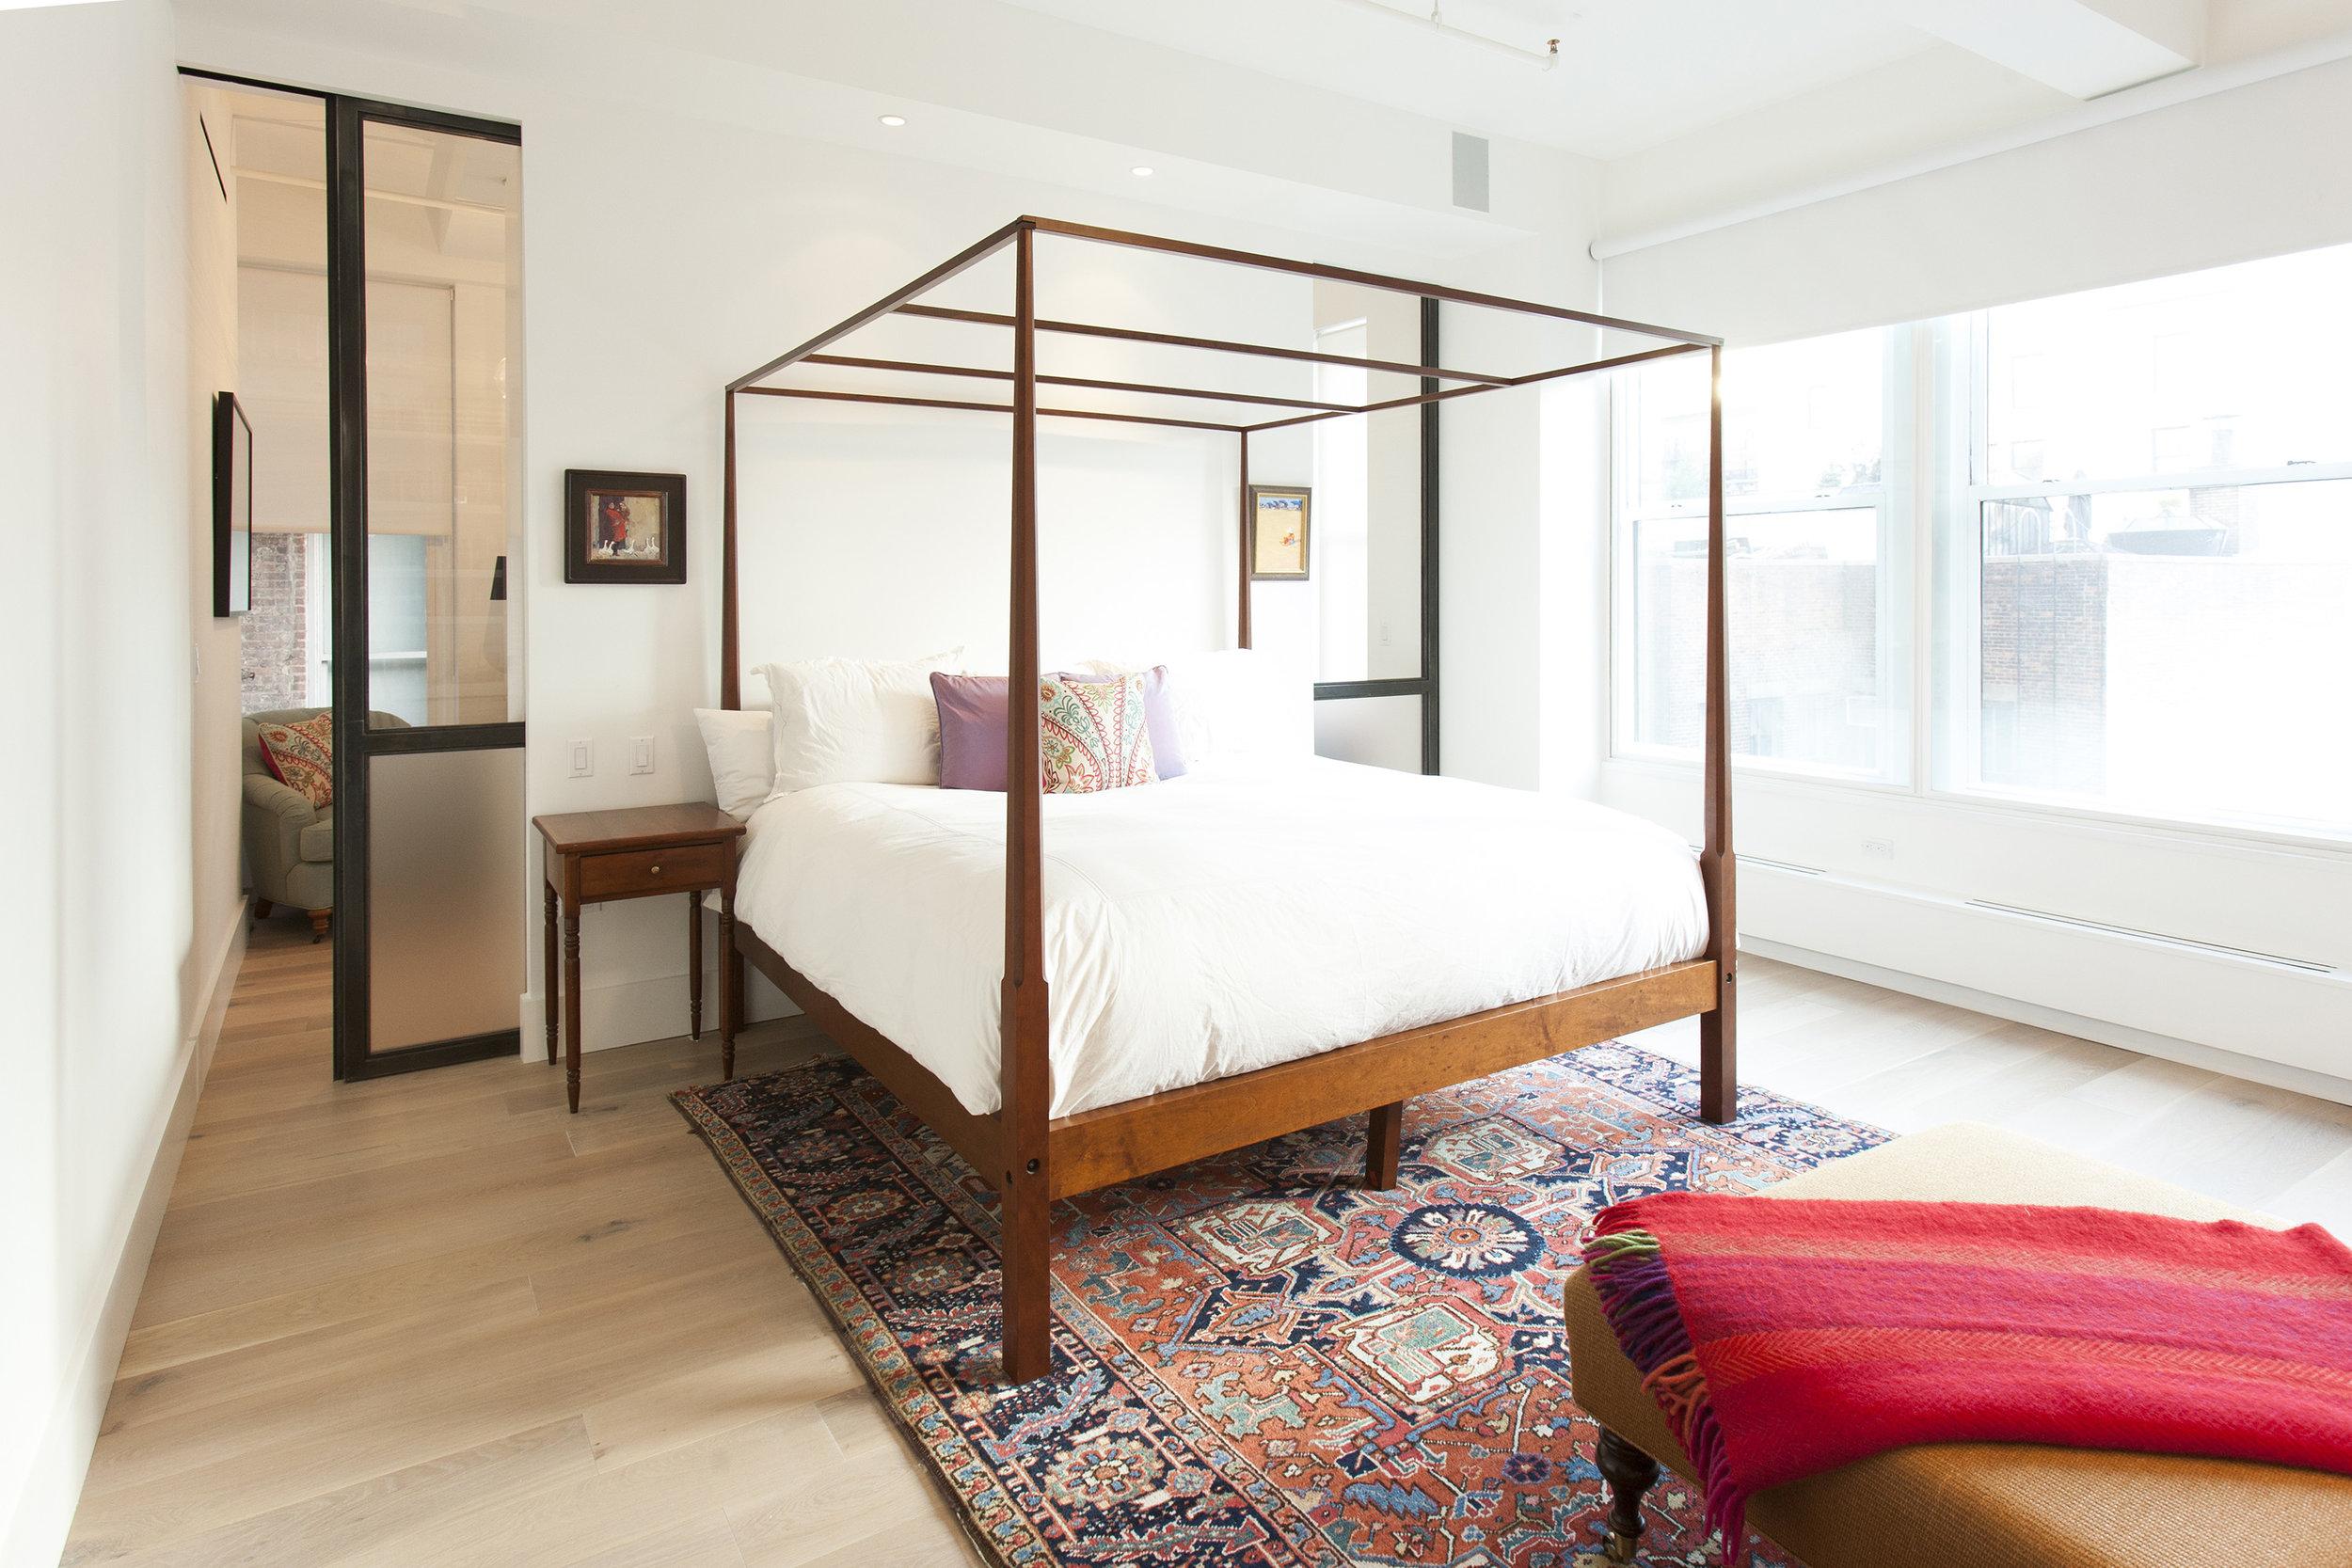 29th street bedroom.jpg